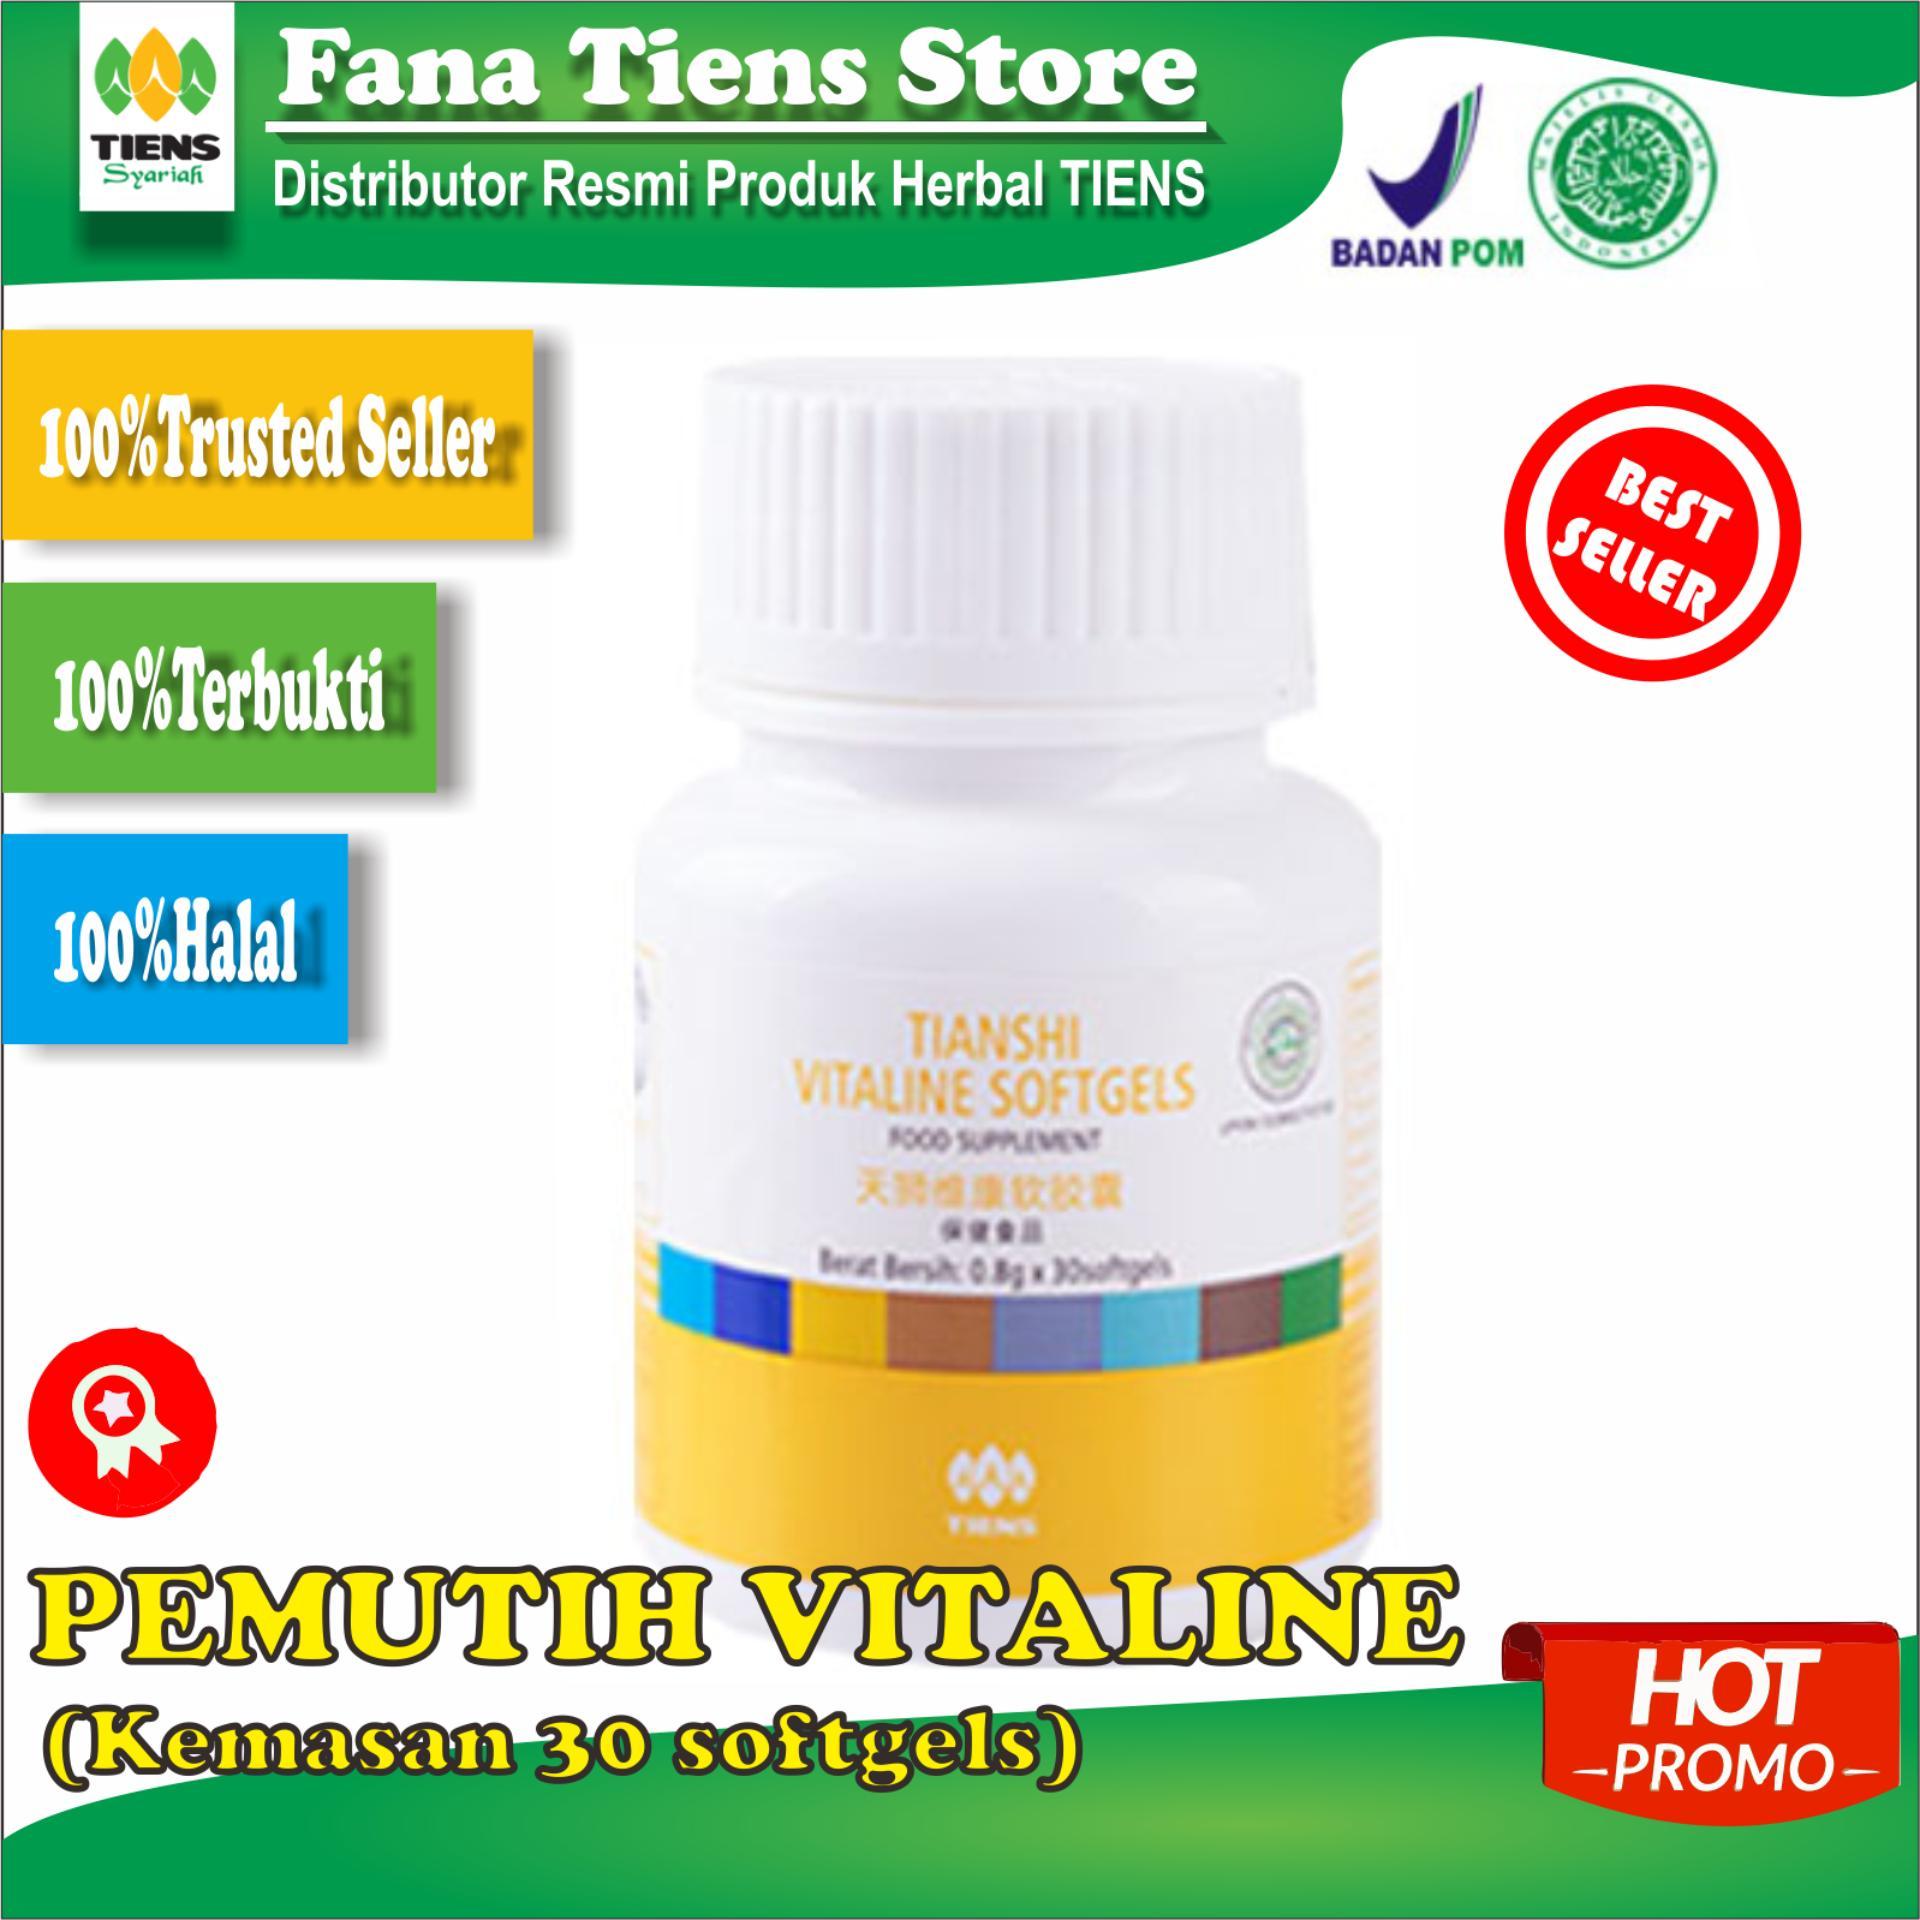 Tiens Herbal Pemutih+Pencerahan Kulit Maksimal Manja Vitaline Paket Hemat (Promo) Seller Resmi by Fana Tiens Store